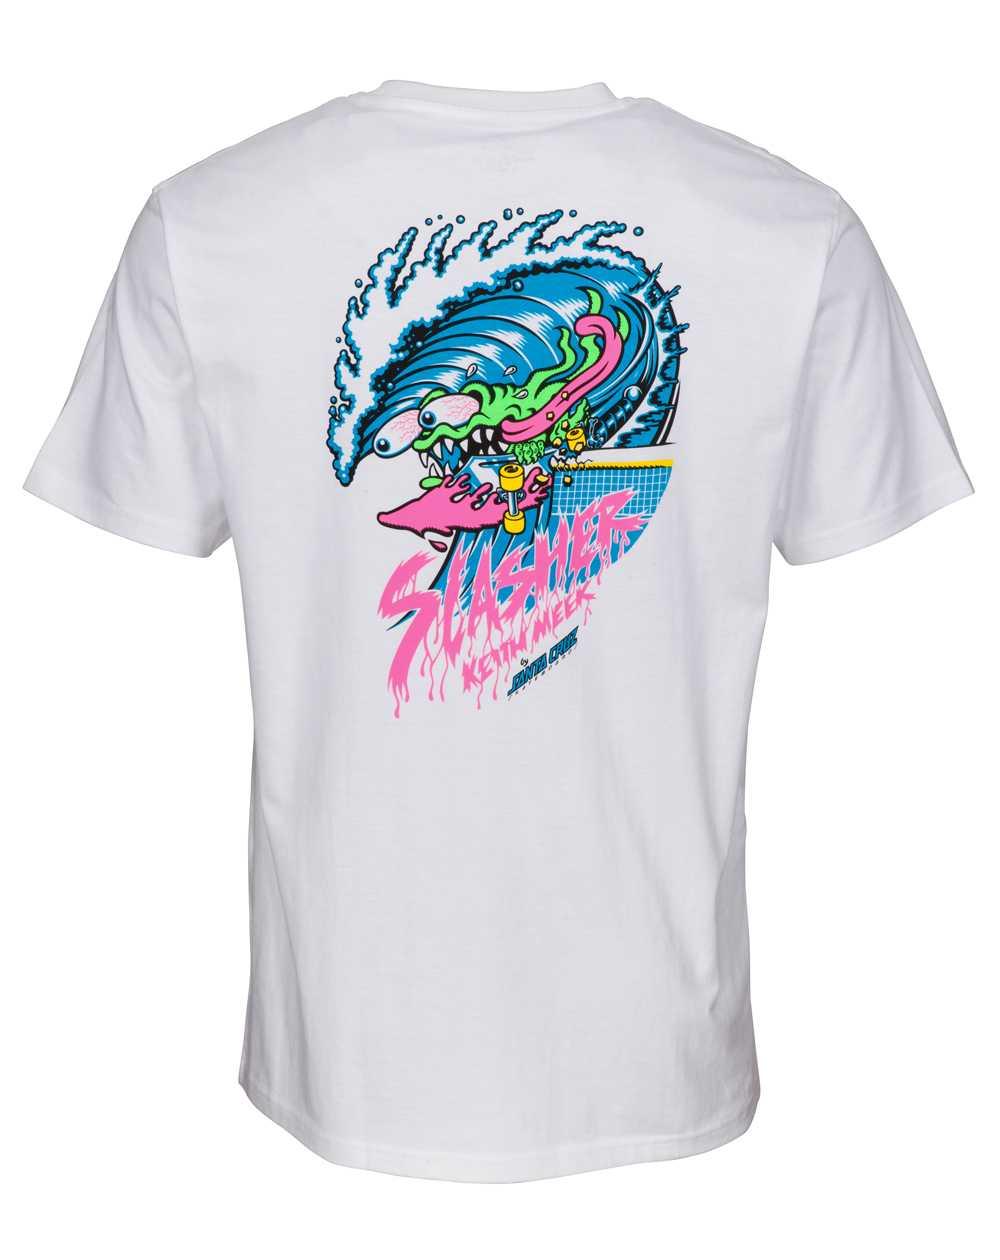 Santa Cruz Men's T-Shirt Wave Slasher White